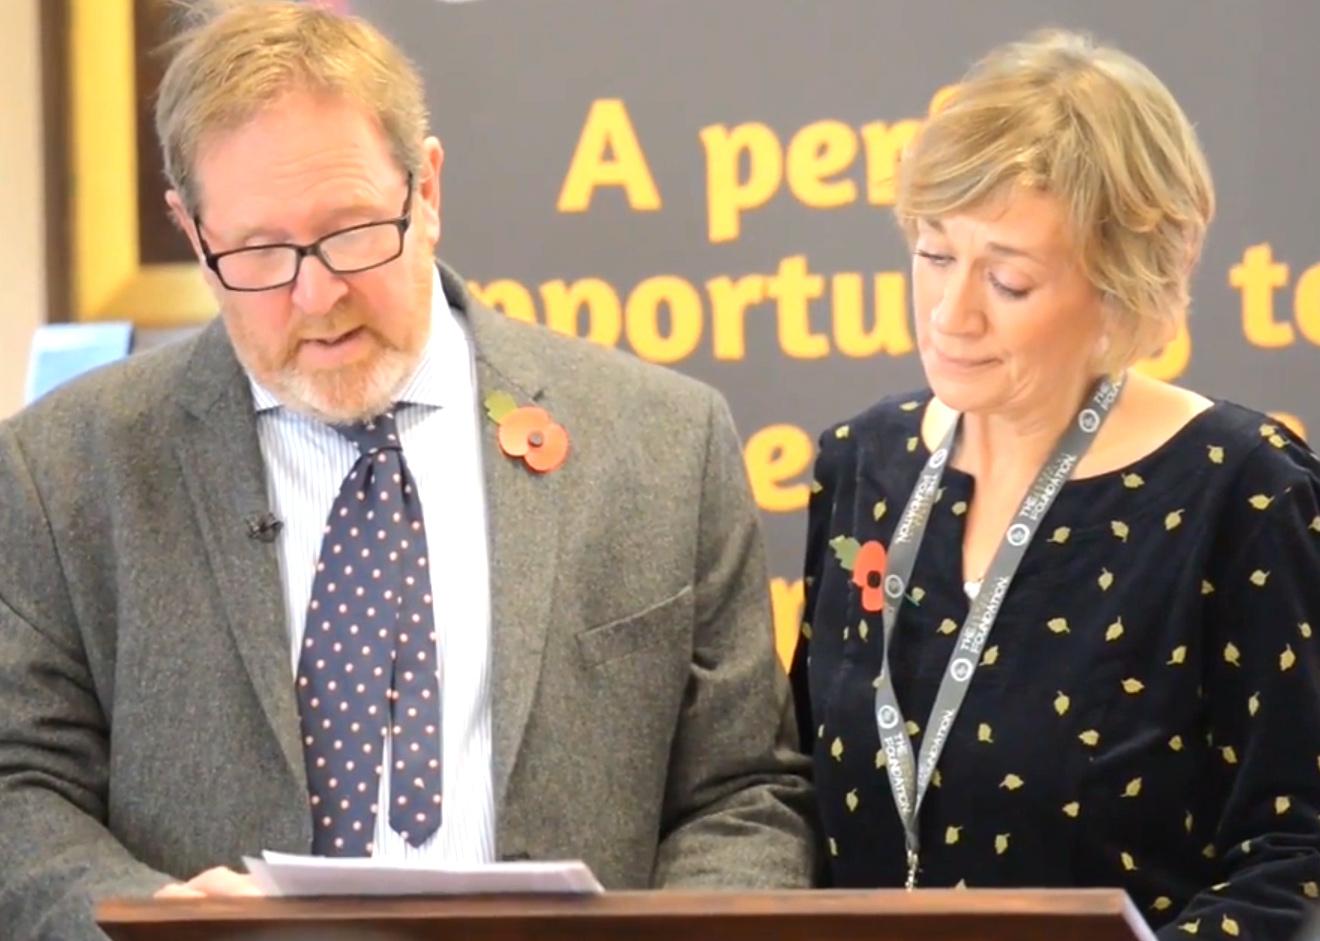 Mark and Beverley Brindley - The James Brindley Foundation